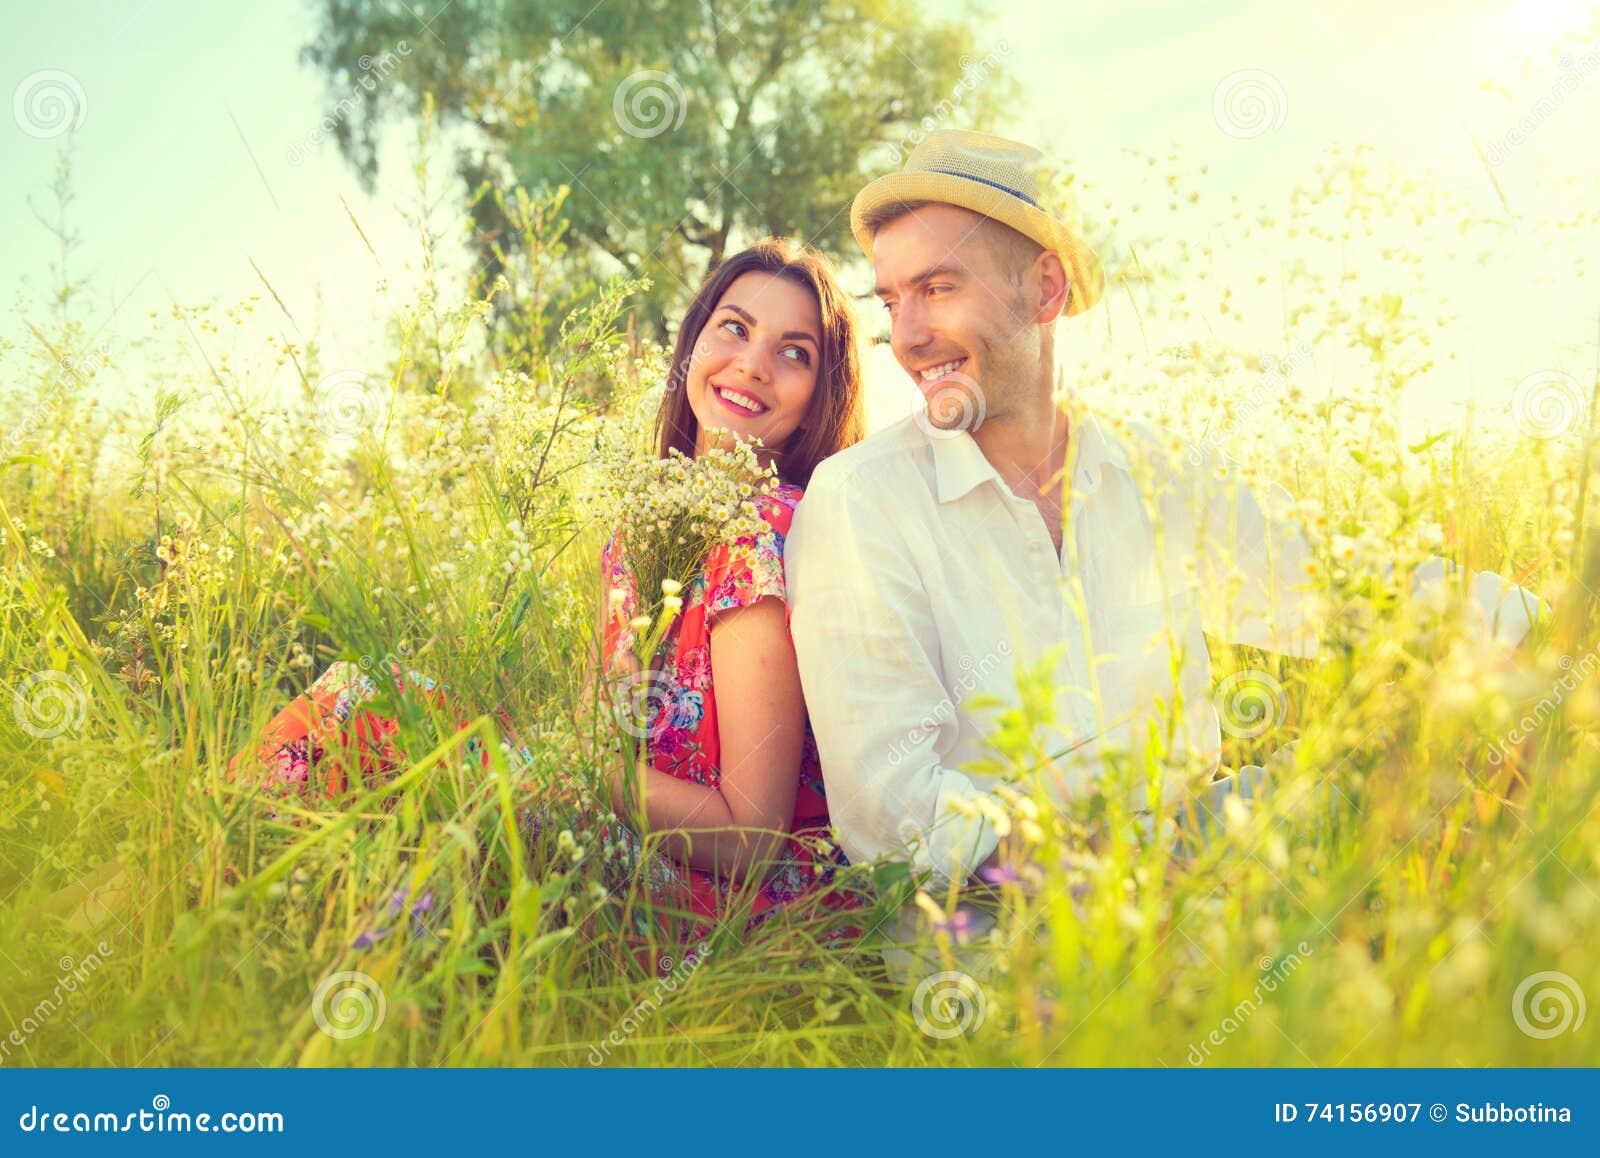 Happy young couple enjoying nature